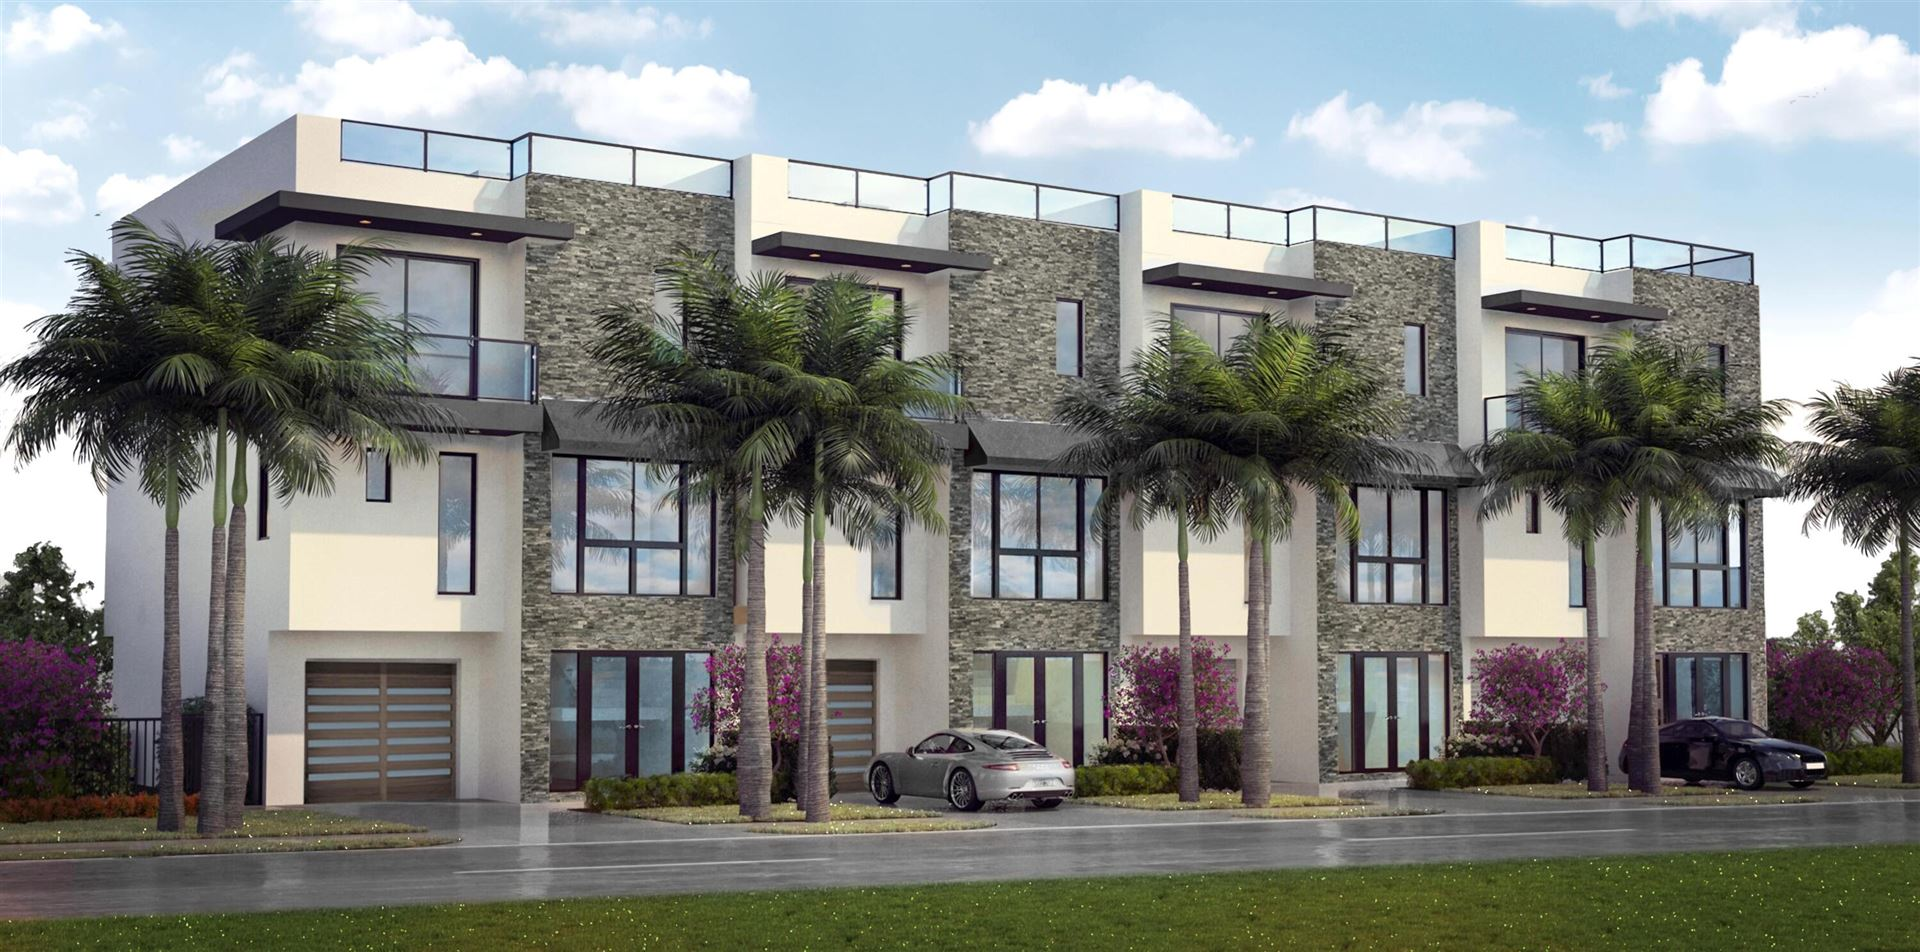 1006 N Riverside Drive, Pompano Beach, FL 33062 - MLS#: RX-10710843